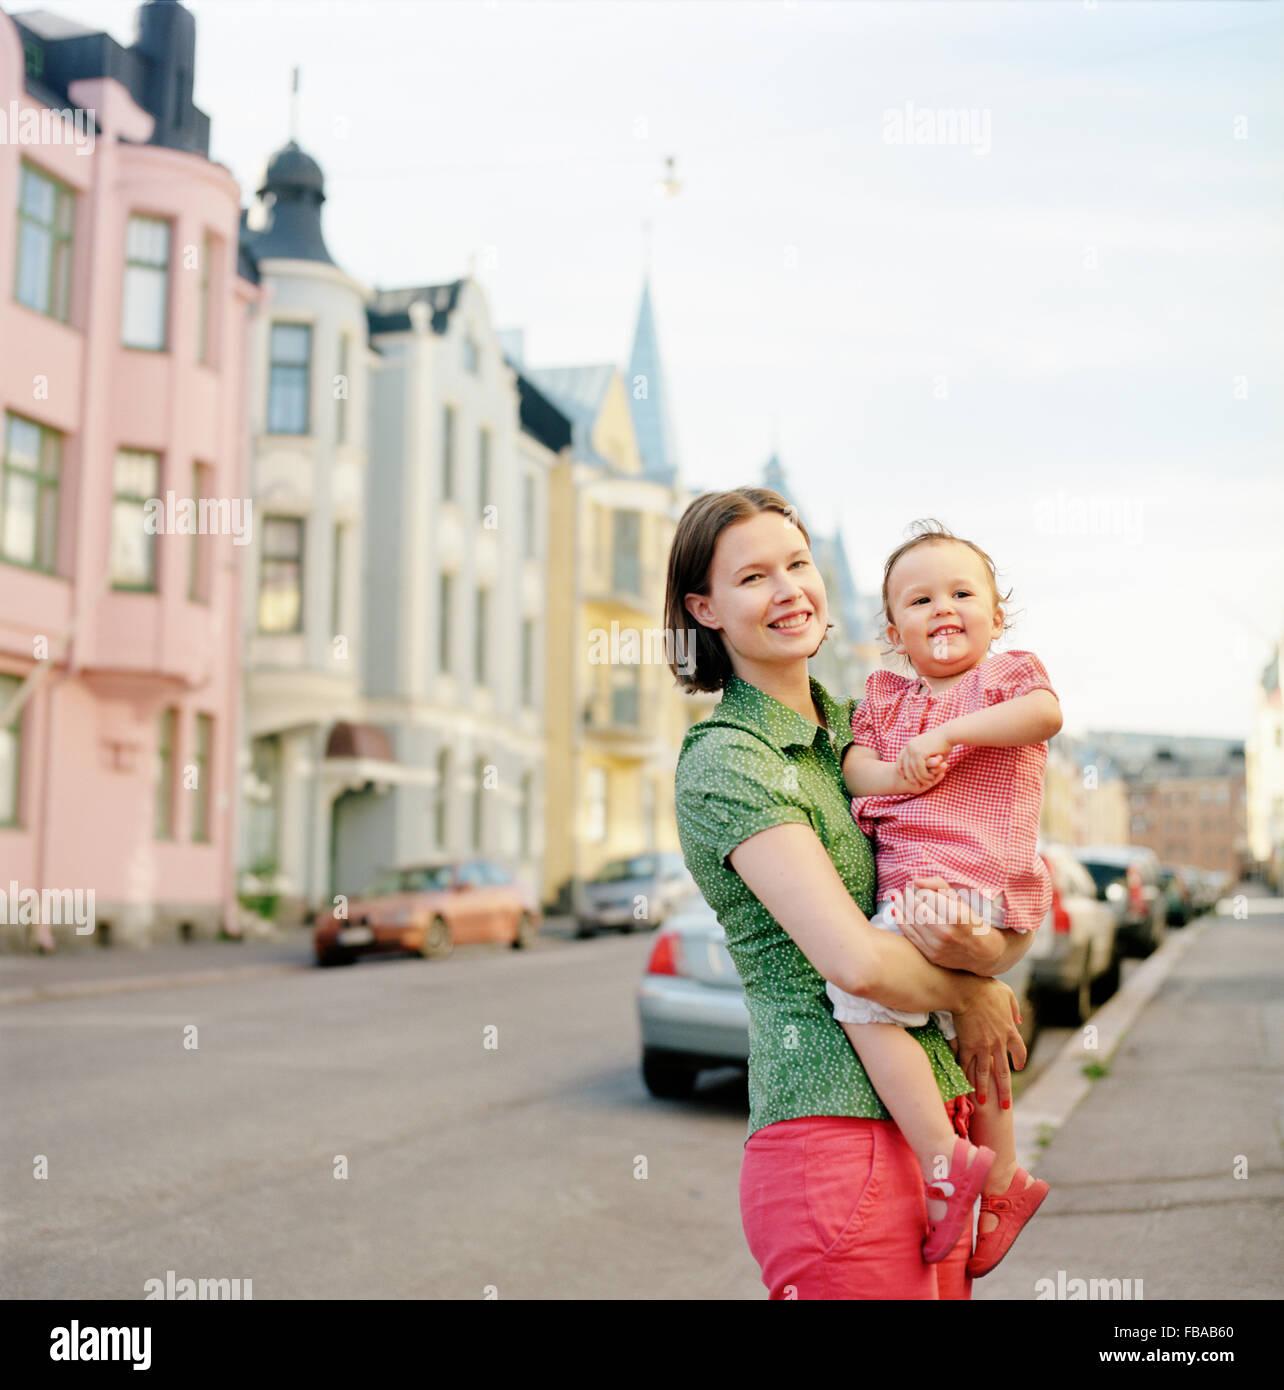 Finlandia, Helsinki, Uusimaa, retrato de la madre sosteniendo hija (2-3) en la calle Imagen De Stock